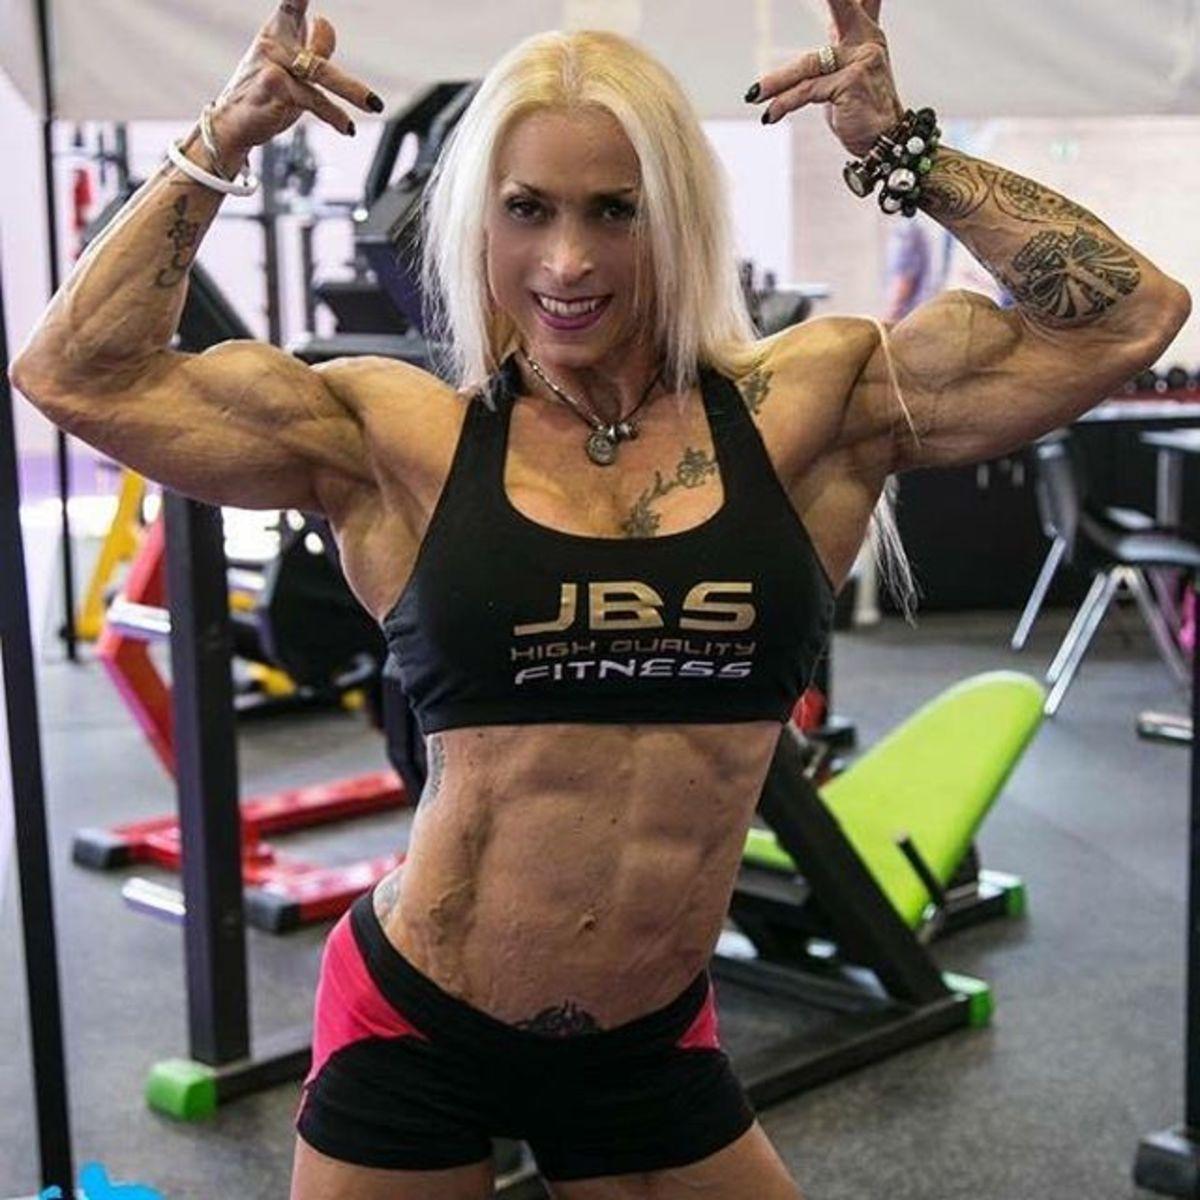 Spanish bodybuilder Paloma Parra